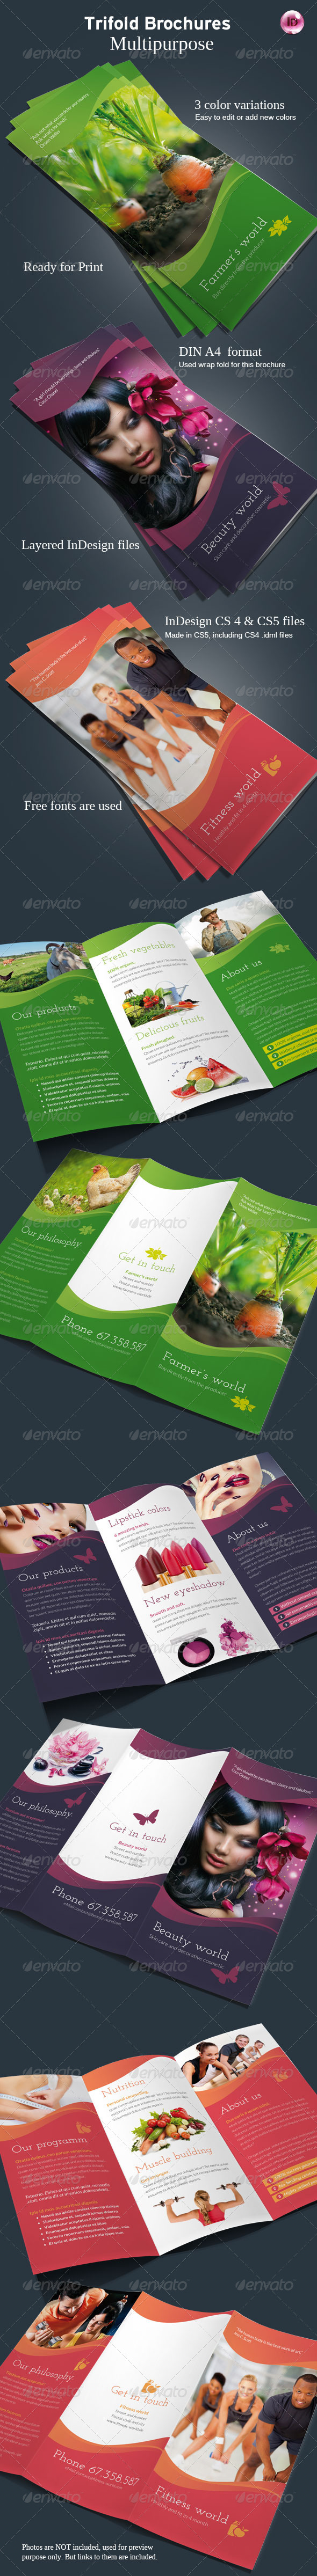 GraphicRiver Multipurpose Trifold Brochures 5065269